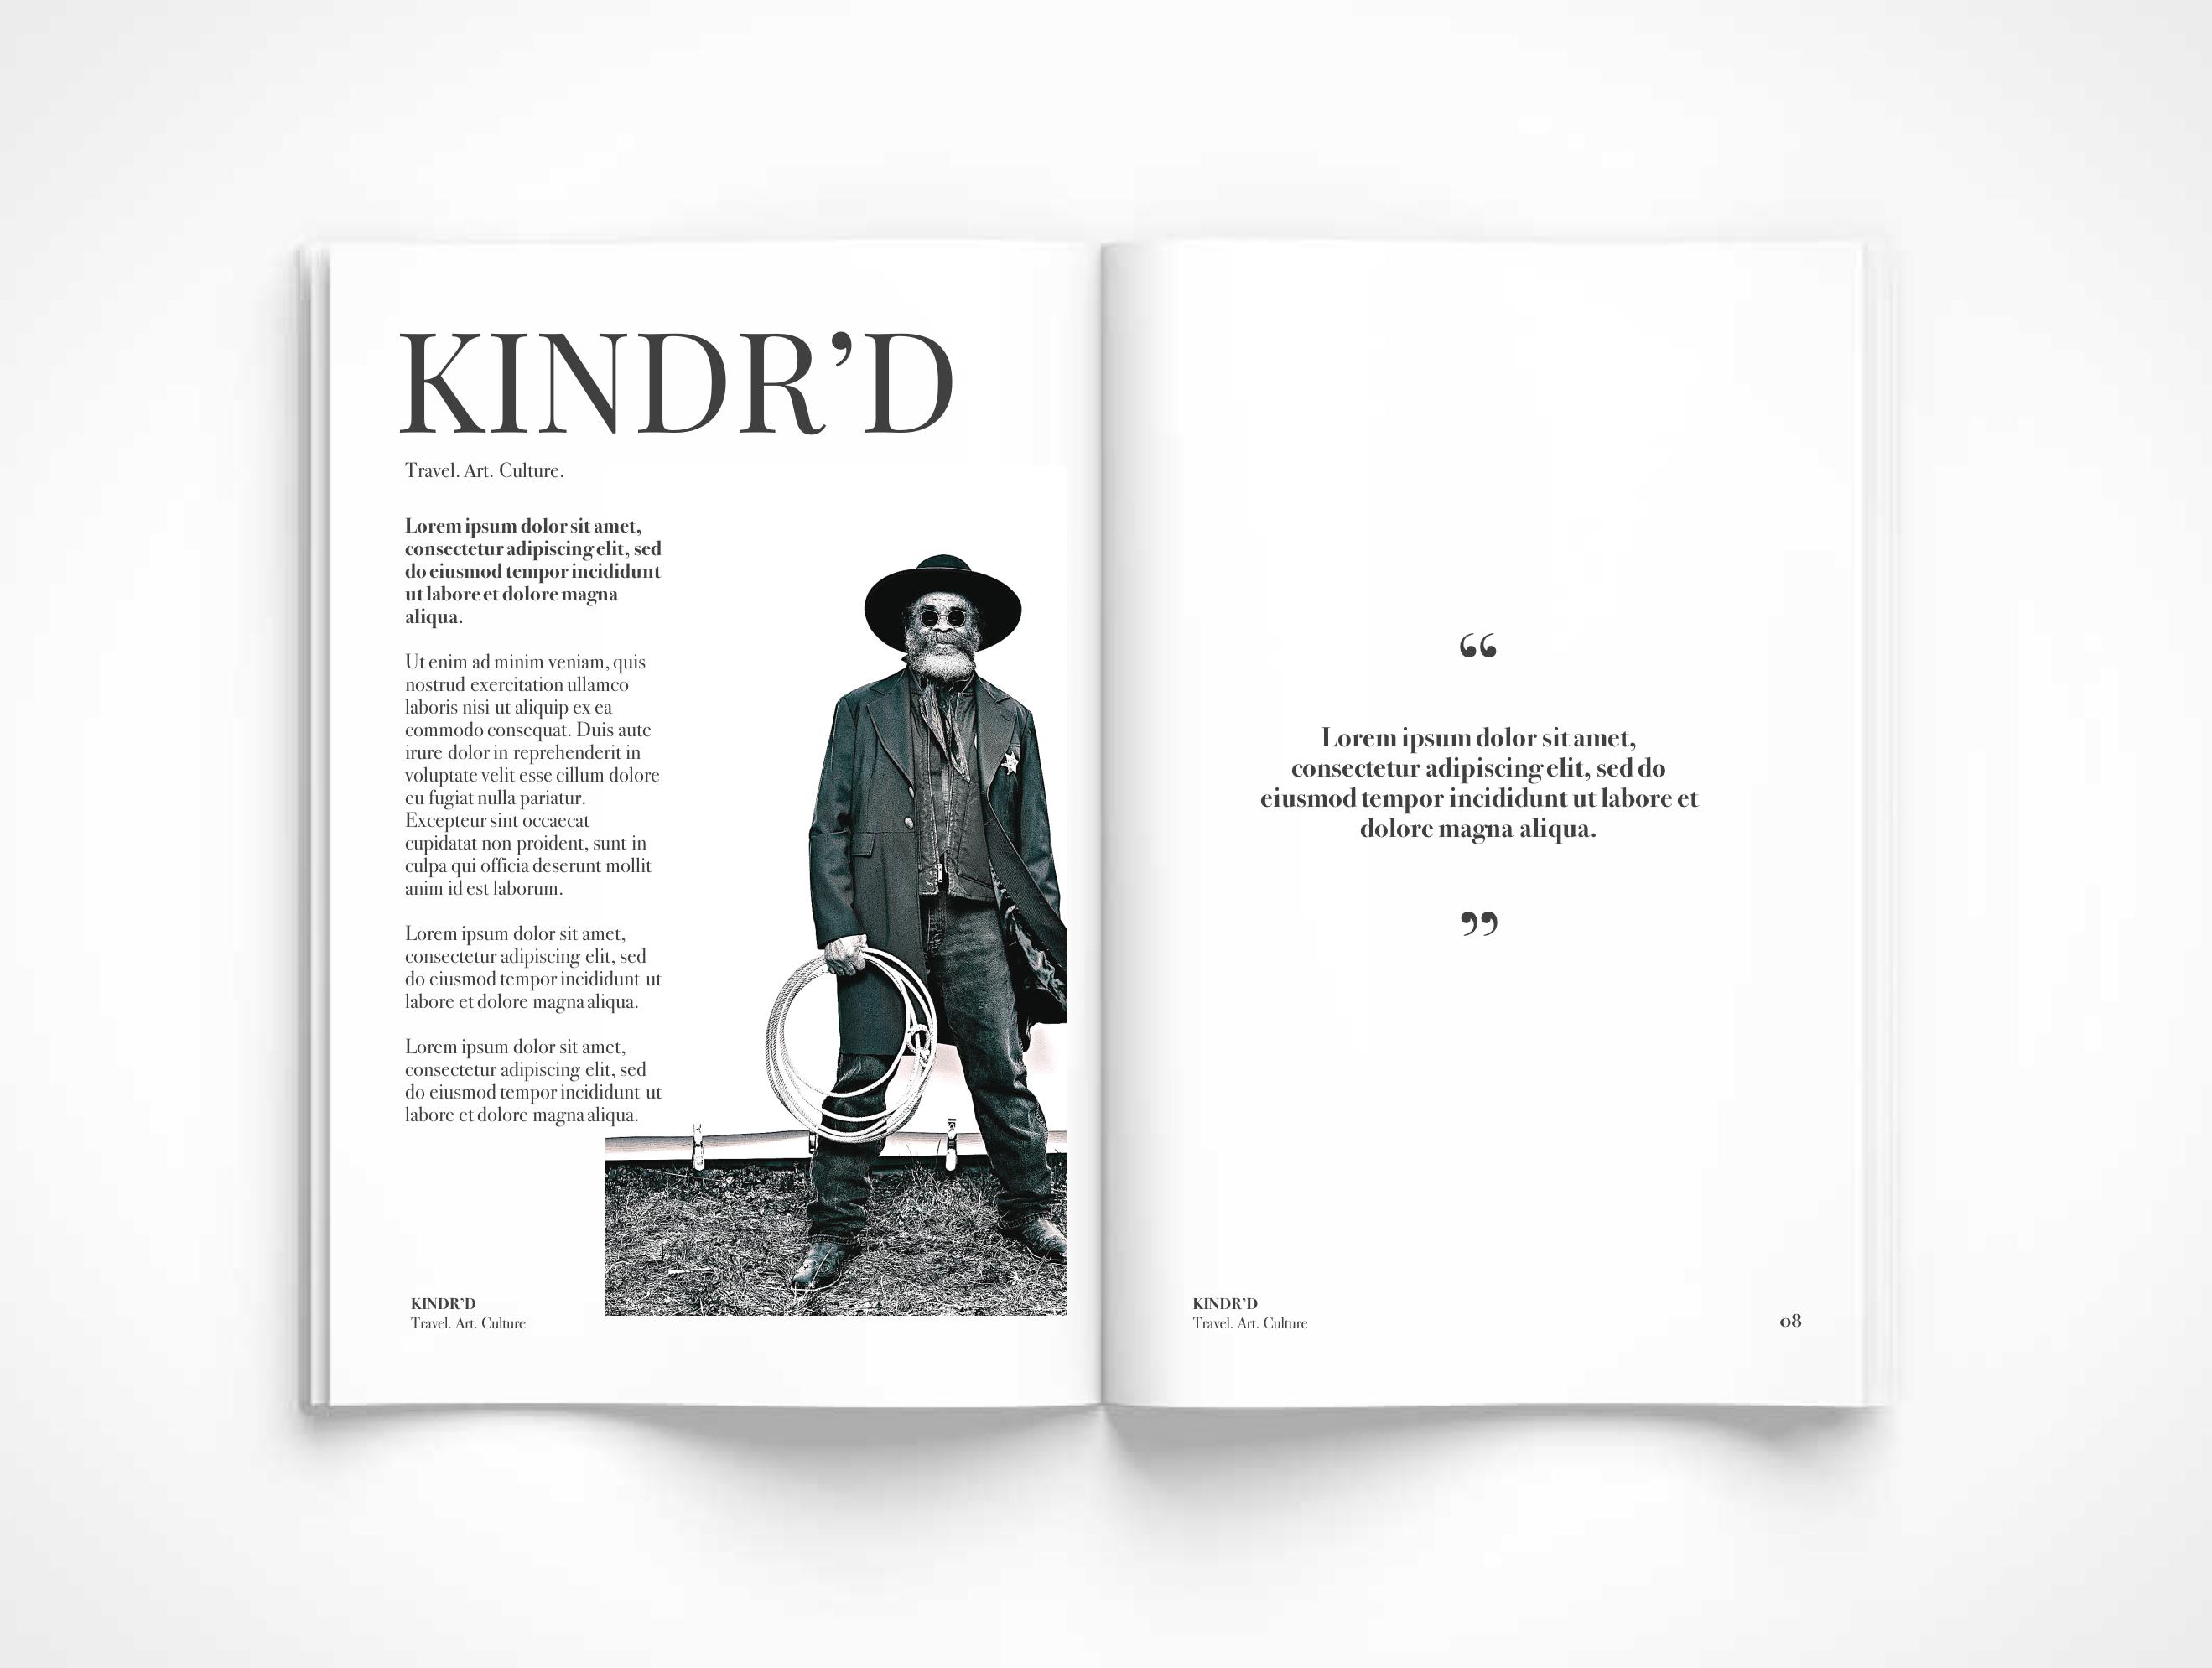 KINDR'D Magazine, KINDR'D, KOLUMN Magazine, KOLUMN, African American Art, African American Travel, African American Culture